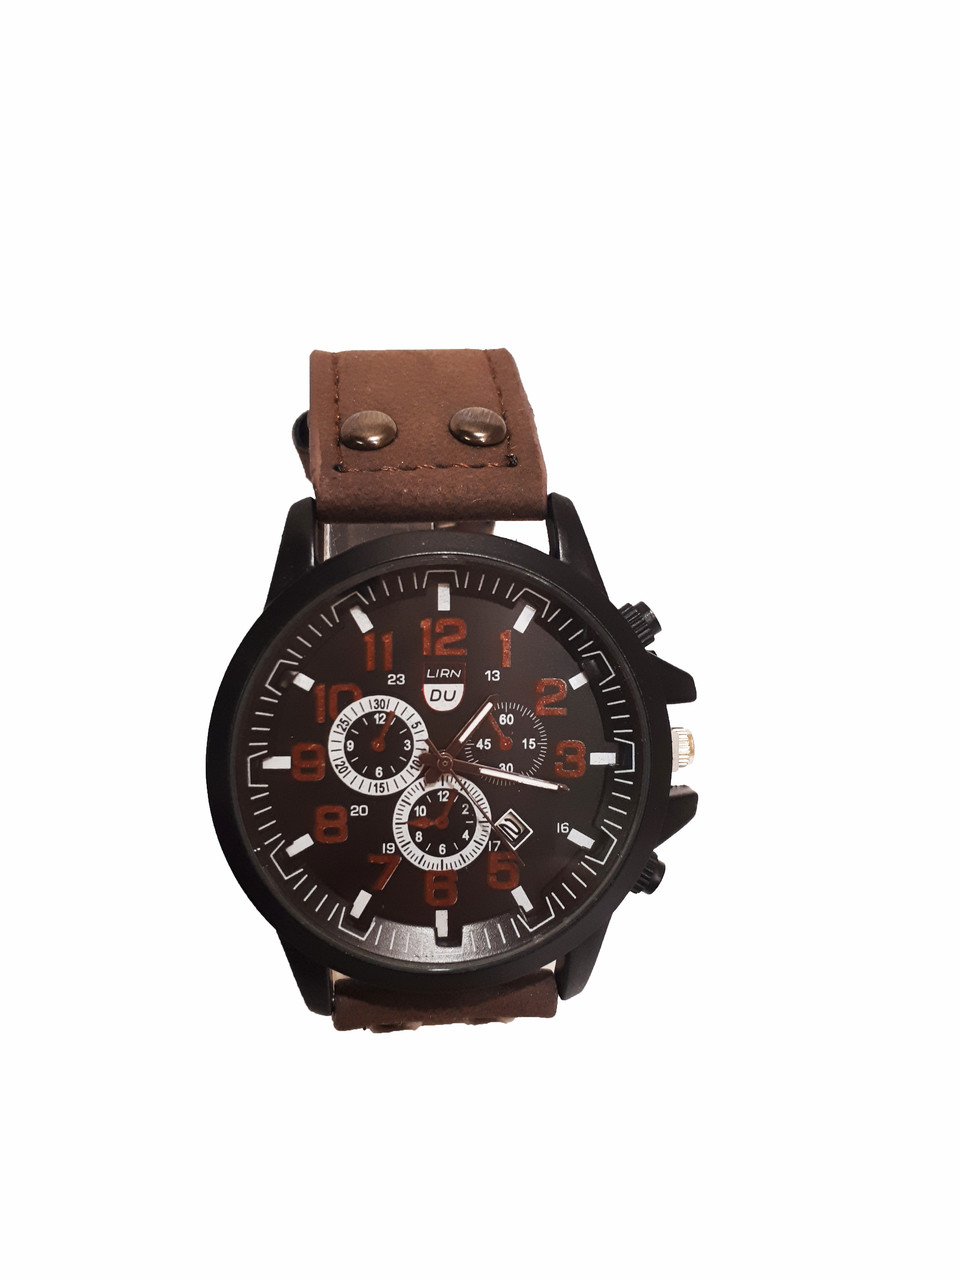 Часы мужские кварцевые DU Коричневые (DU-030Br)